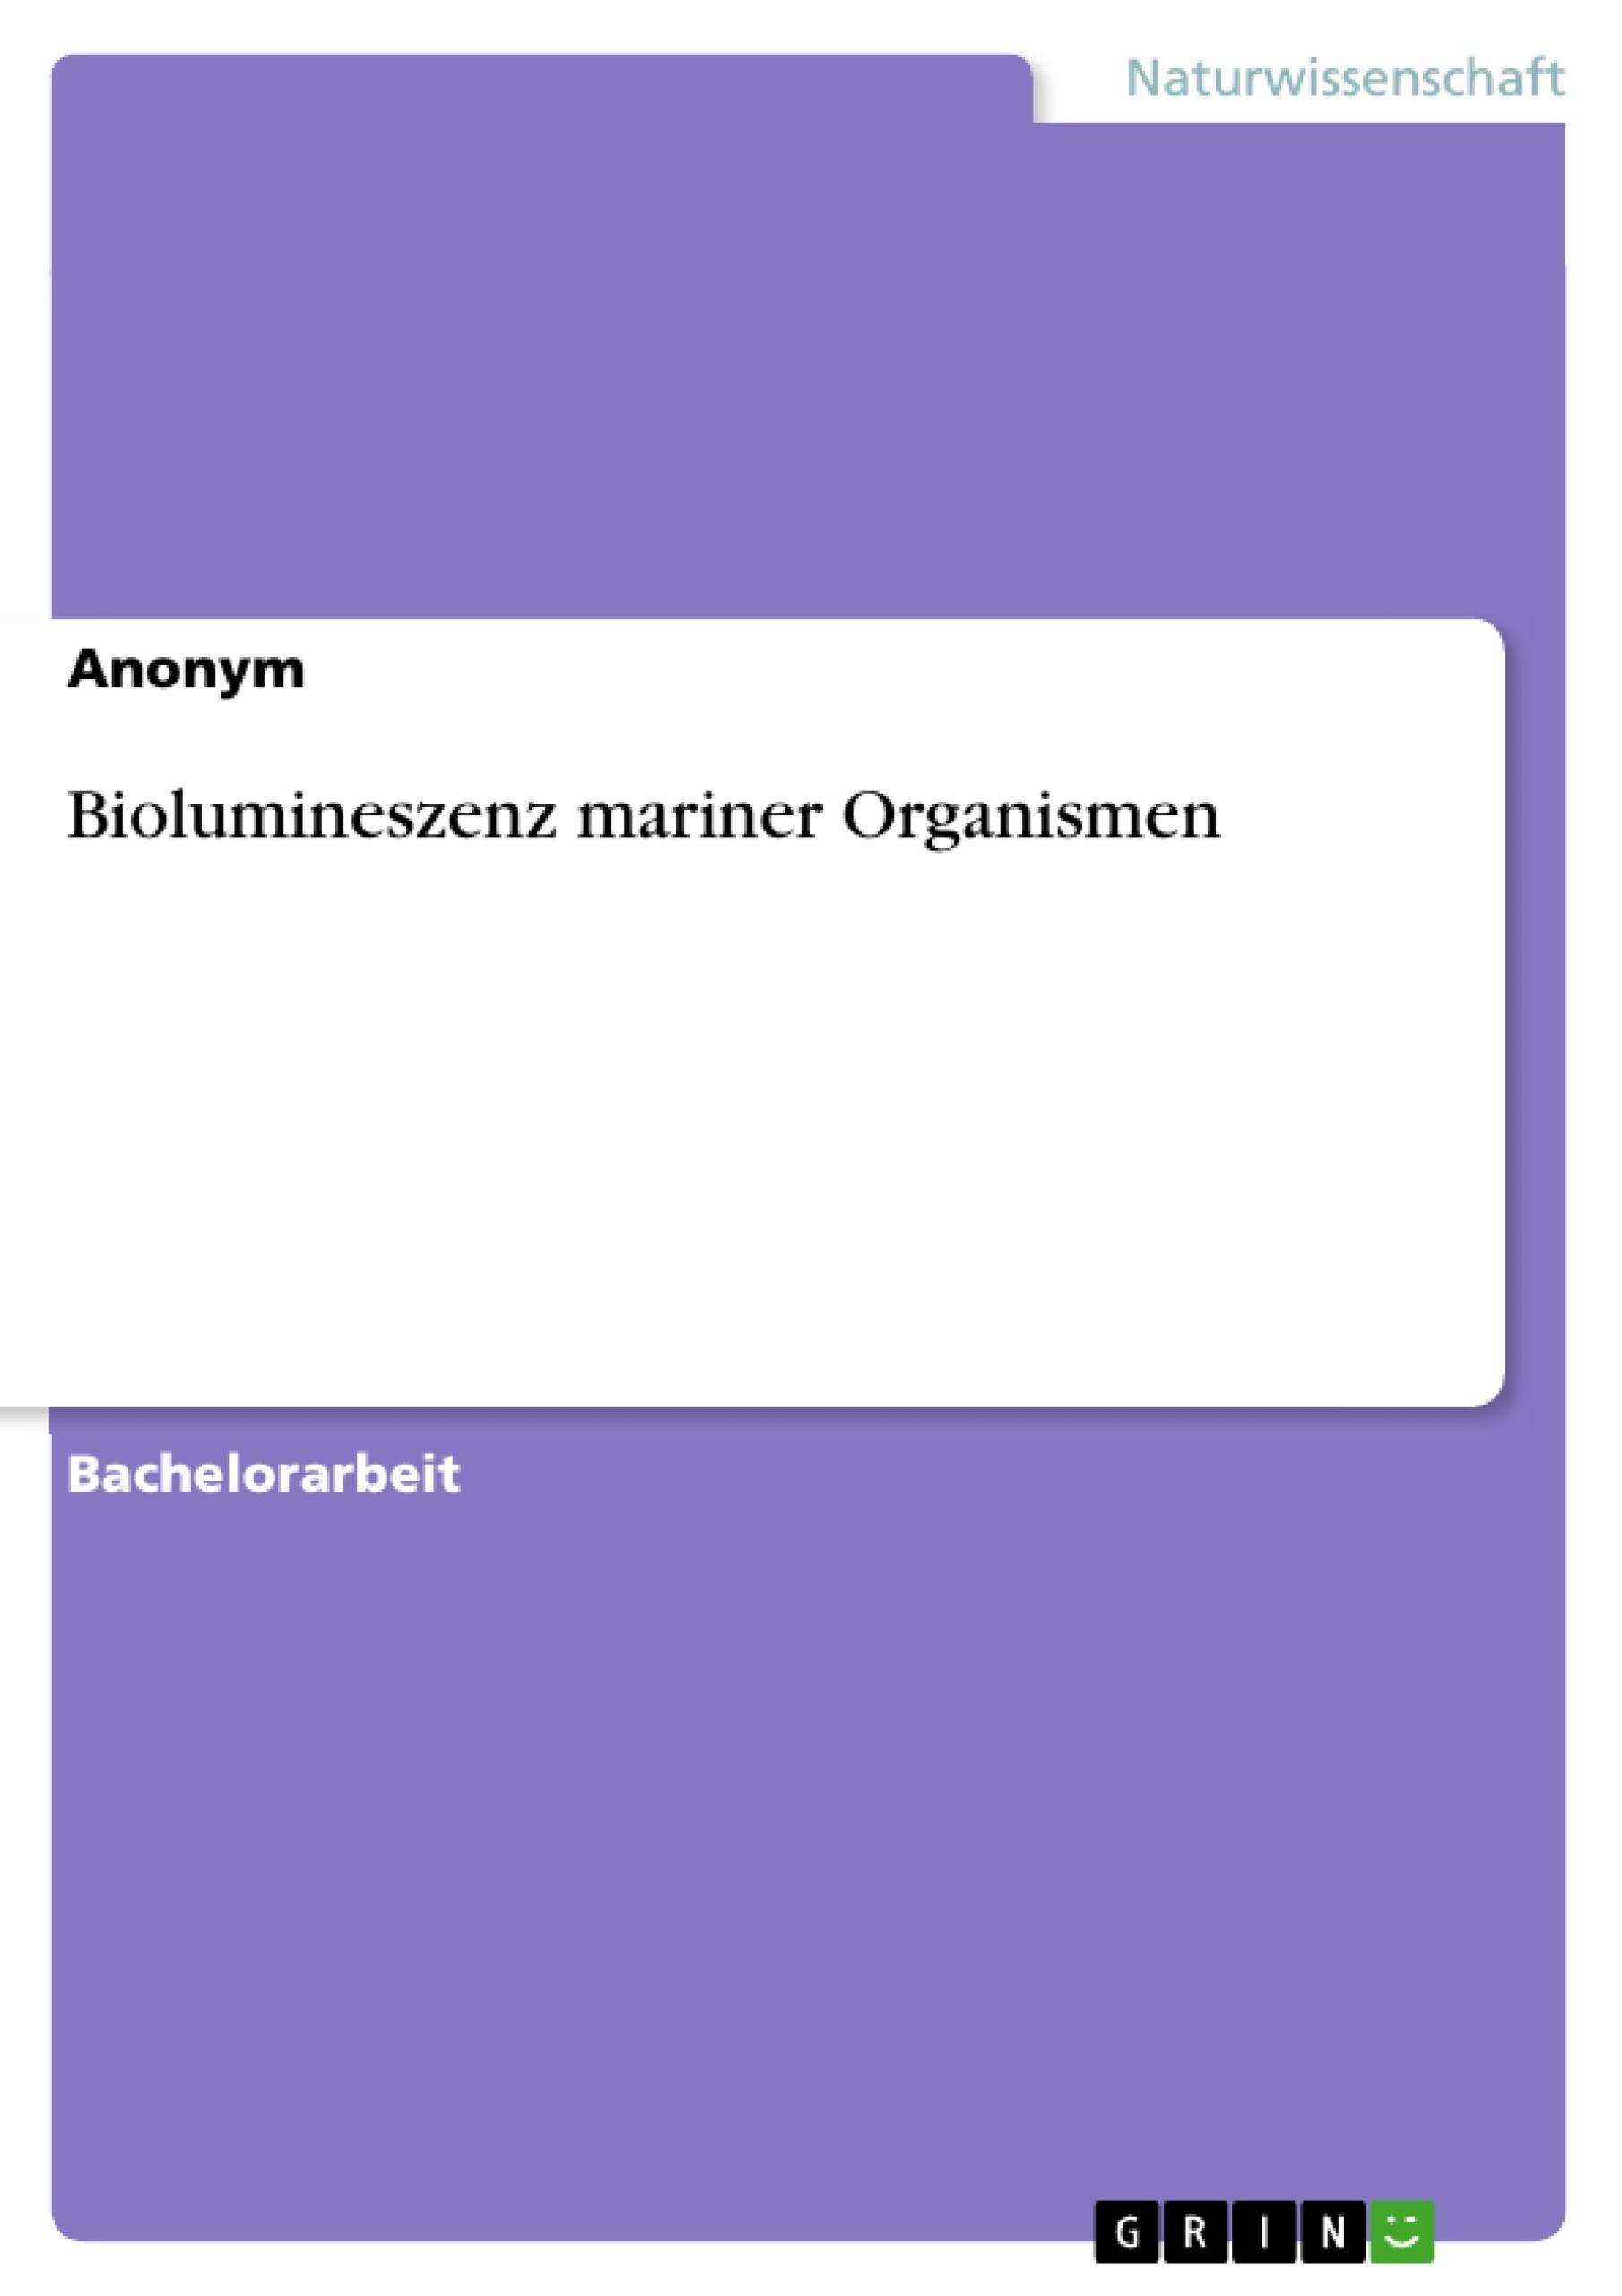 Titel: Biolumineszenz mariner Organismen